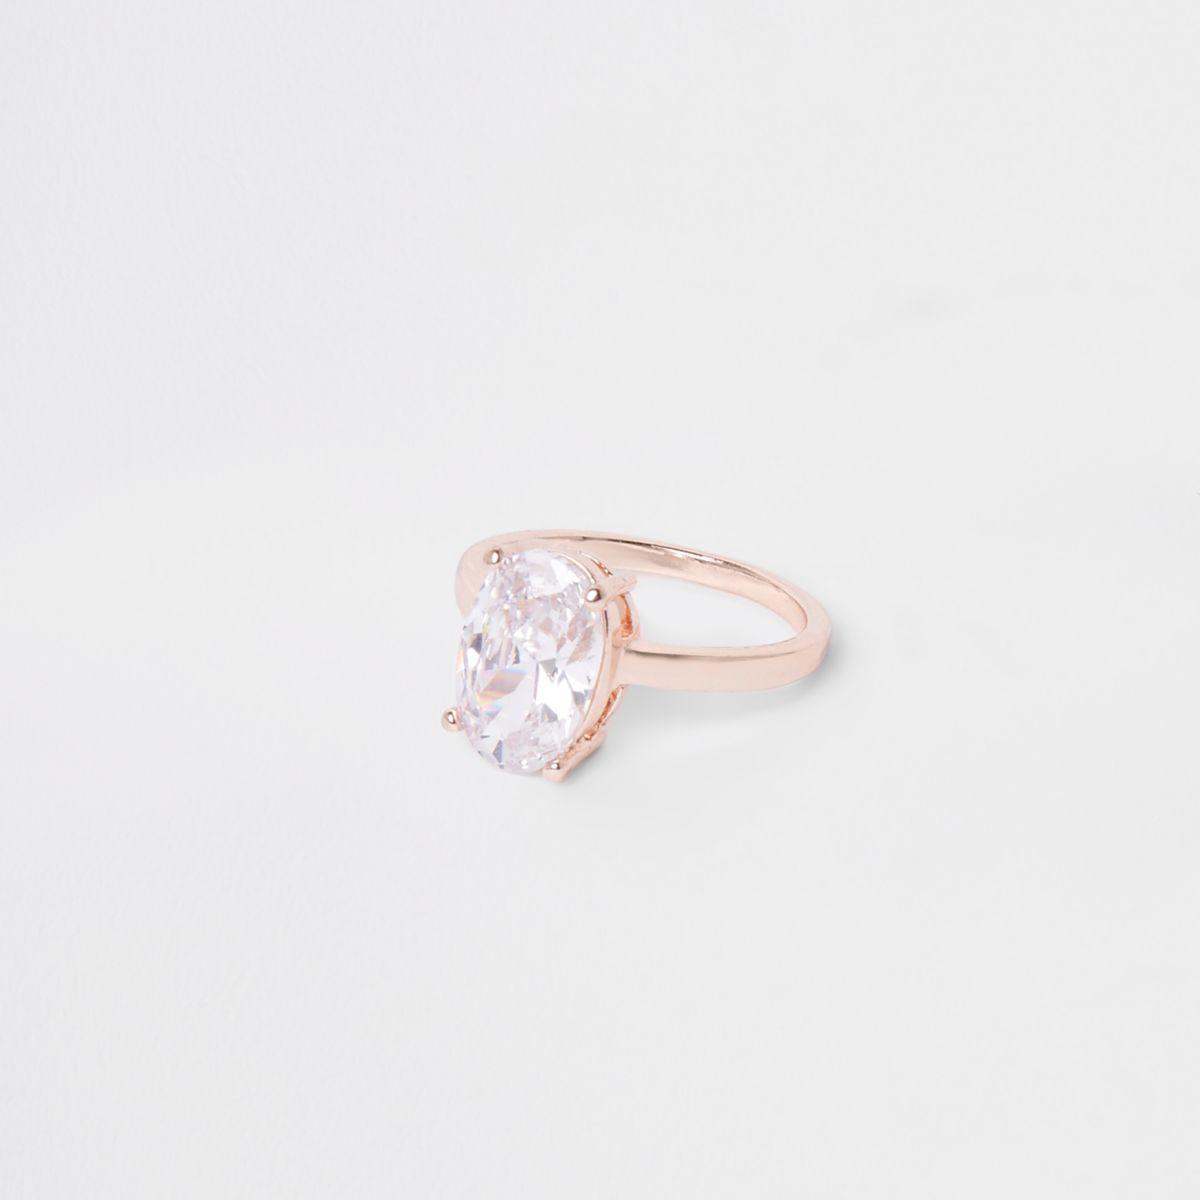 Rose gold tone cubic zirconia ring